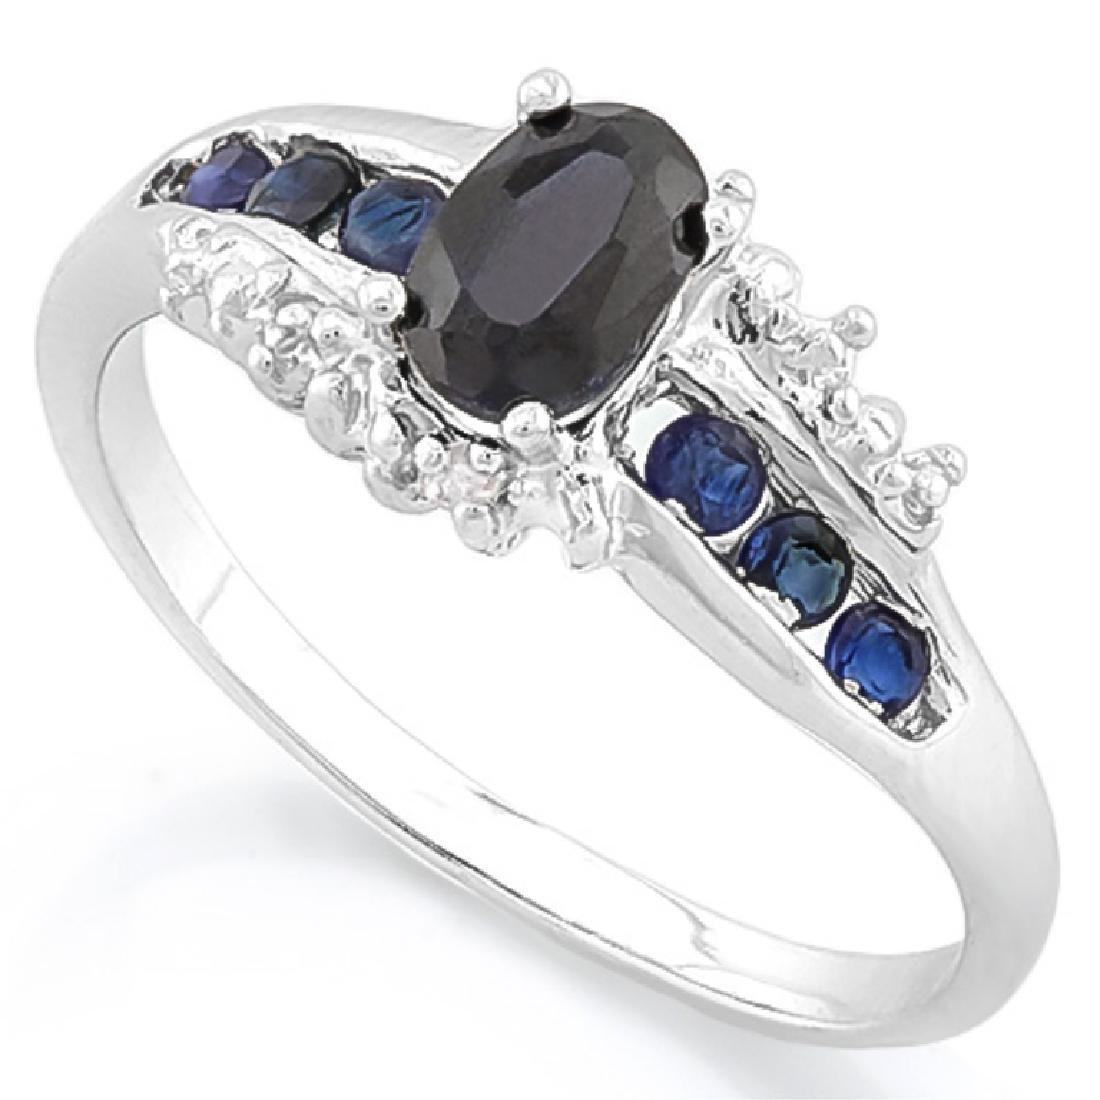 BEAUTIFUL 4CT BLACK SAPPHIRE ART DECO STYLE RING